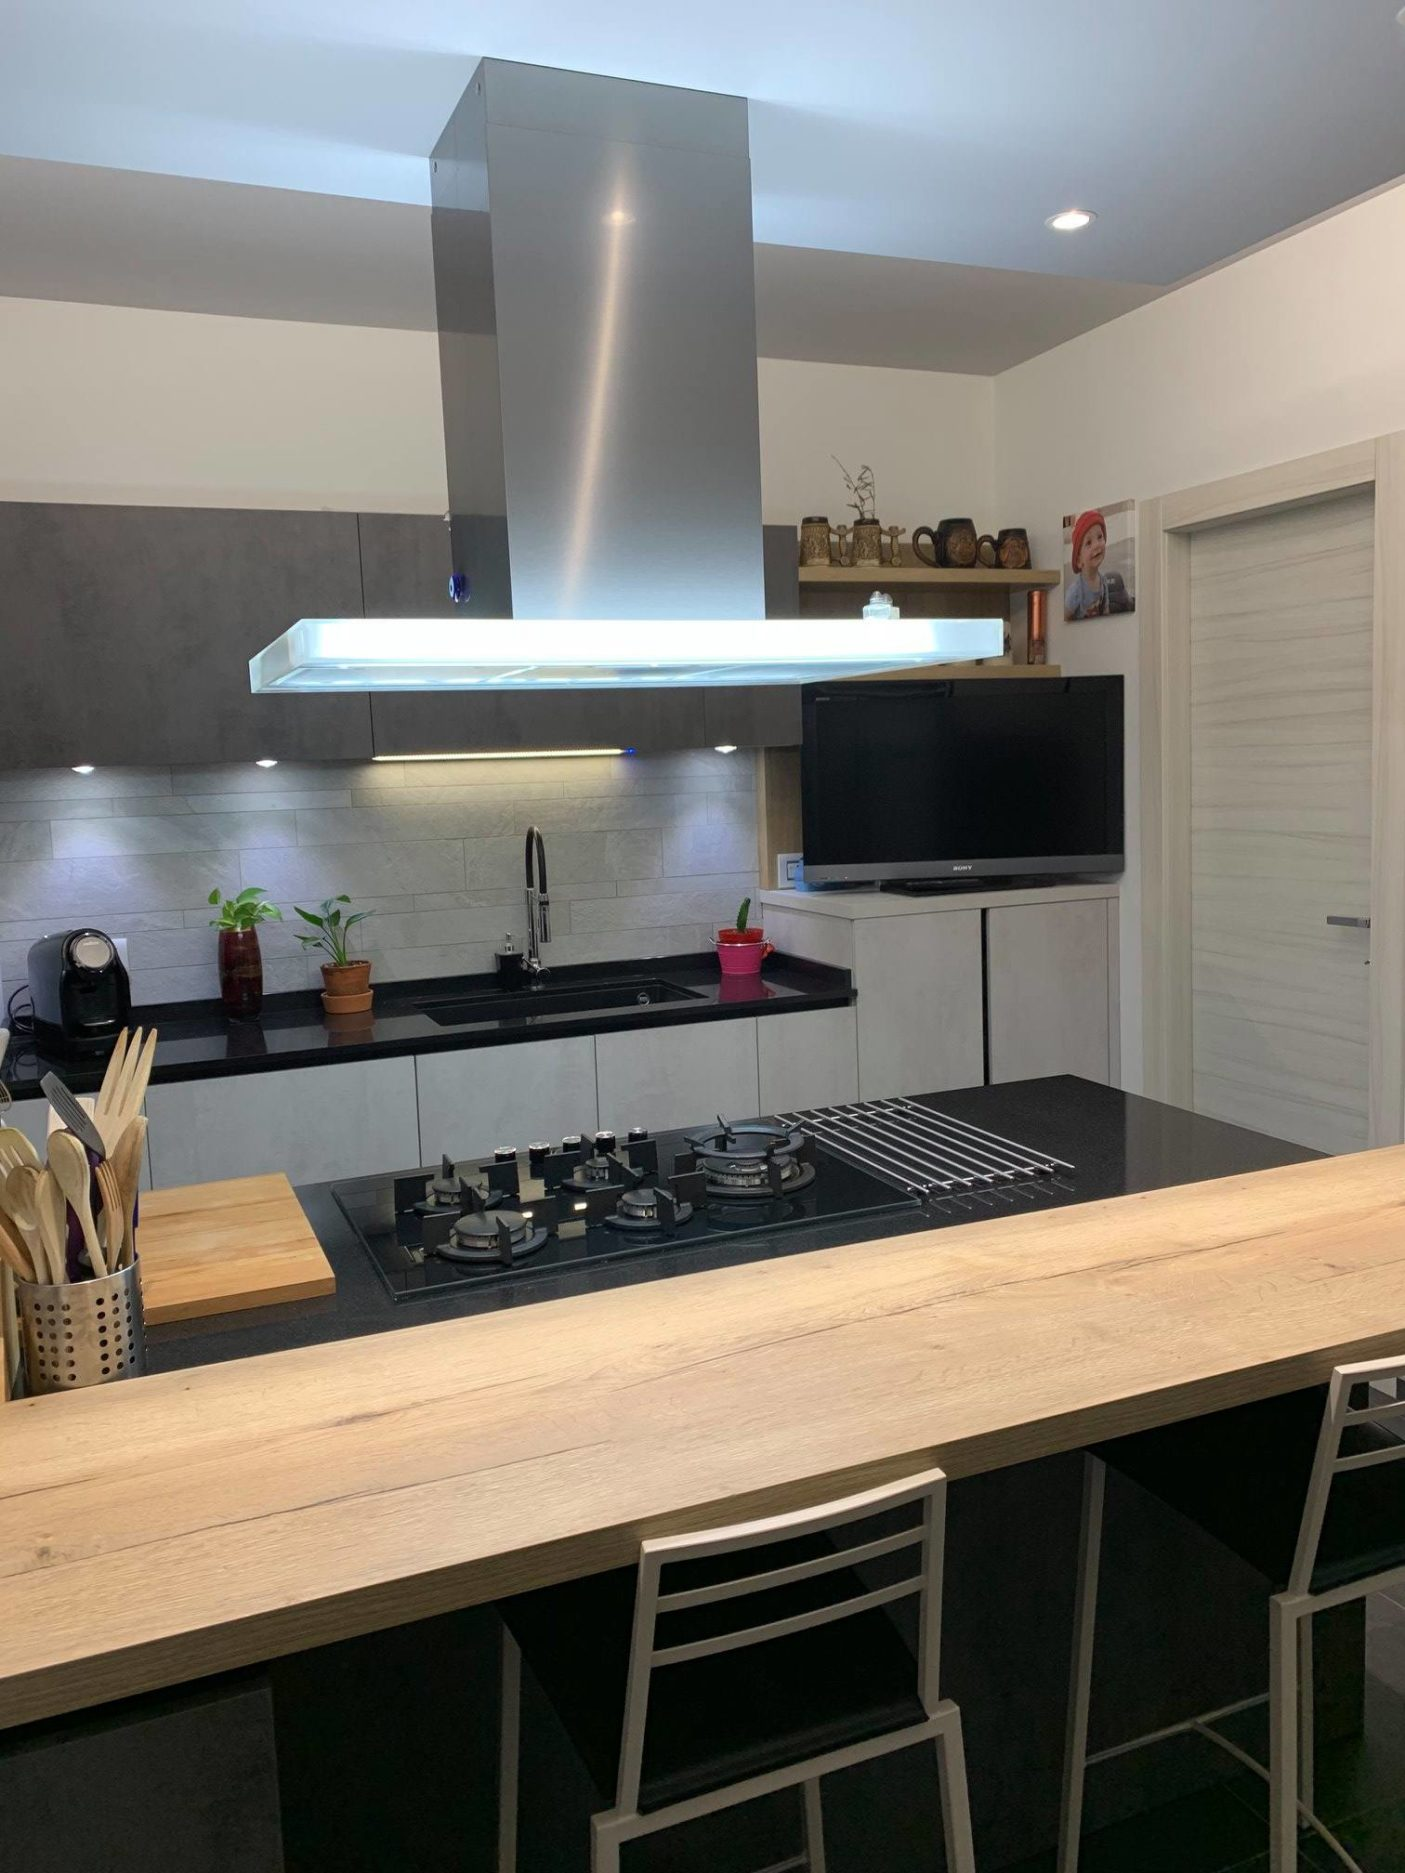 Cucina-Creo-Kitchens-Tablet-Personalizzata2-1.jpg